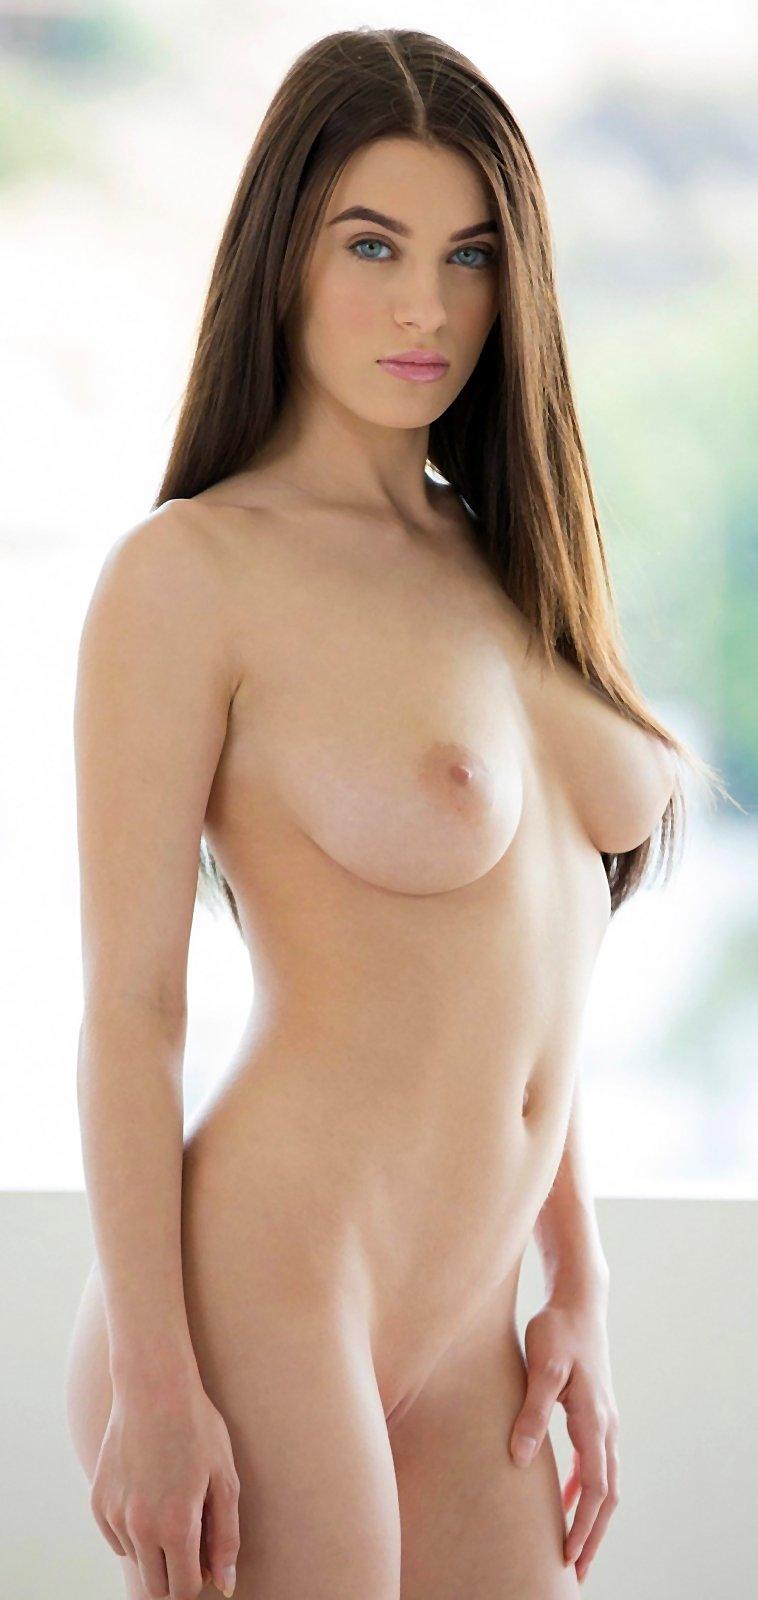 Gorgeous busty brunette Lana Rhoades on Babepedia